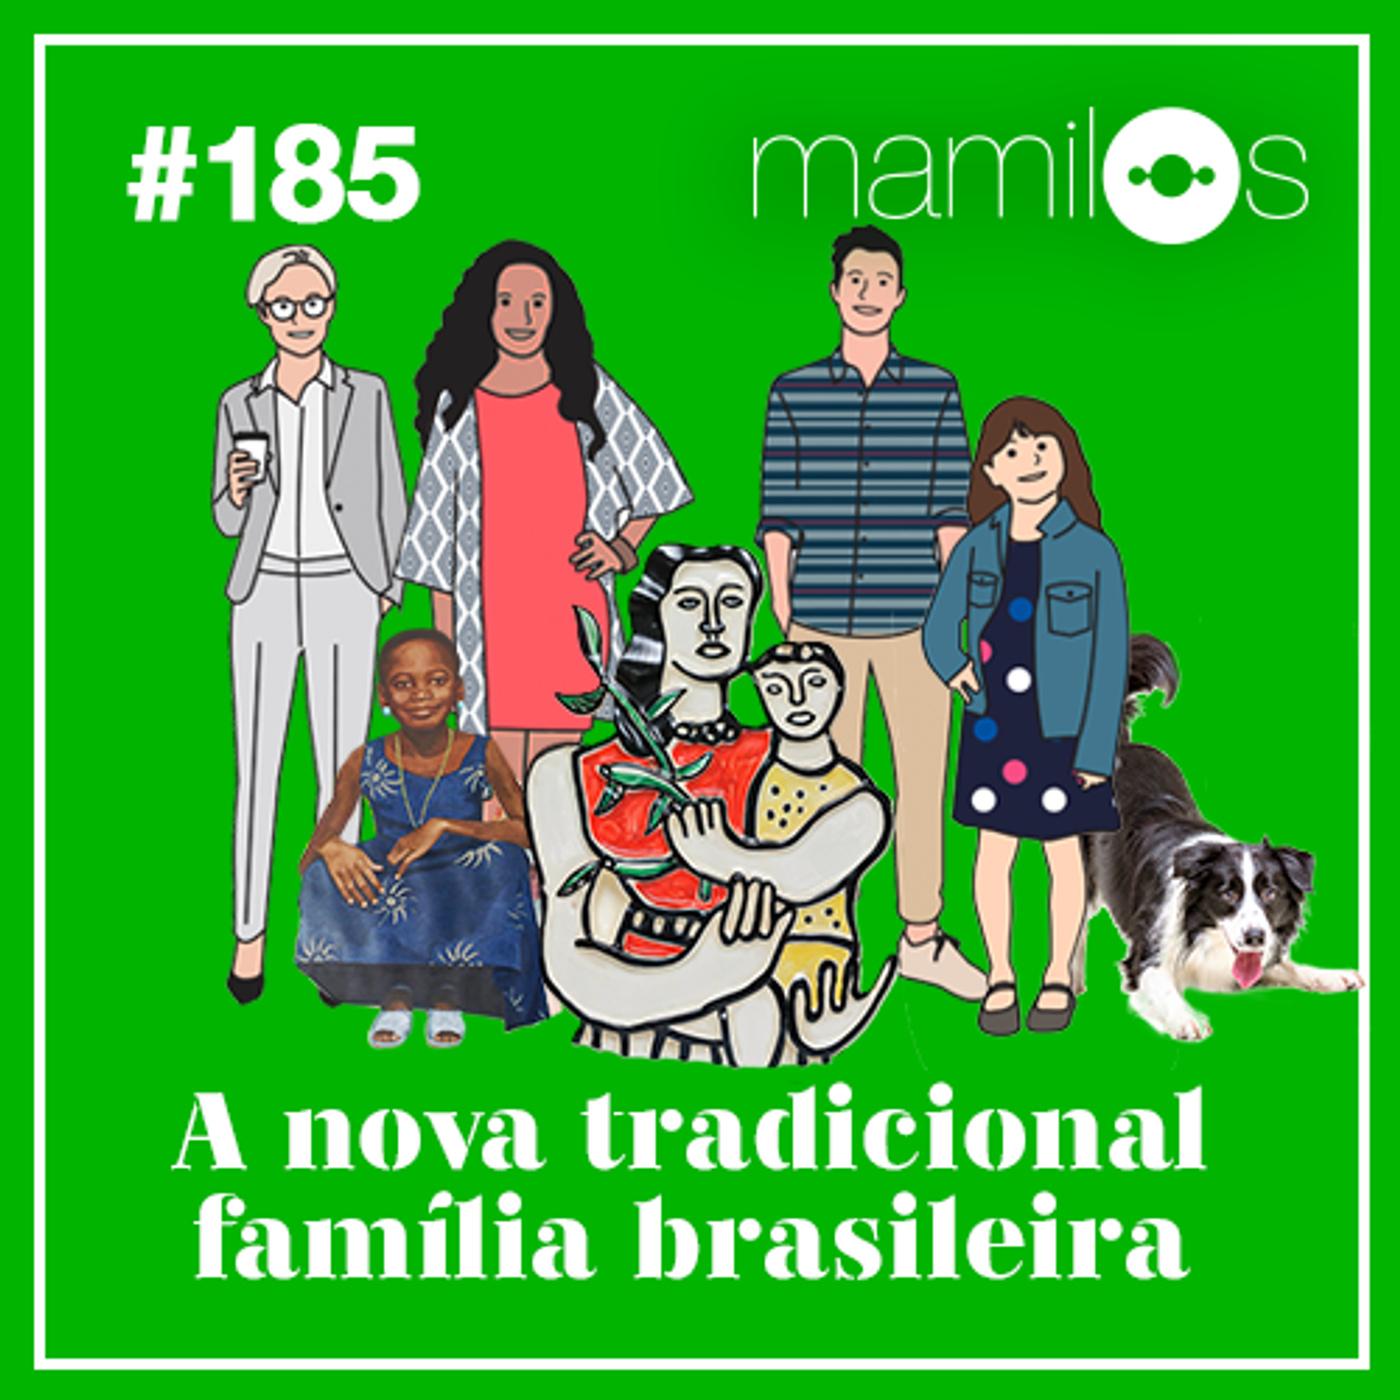 A Nova Tradicional Família Brasileira